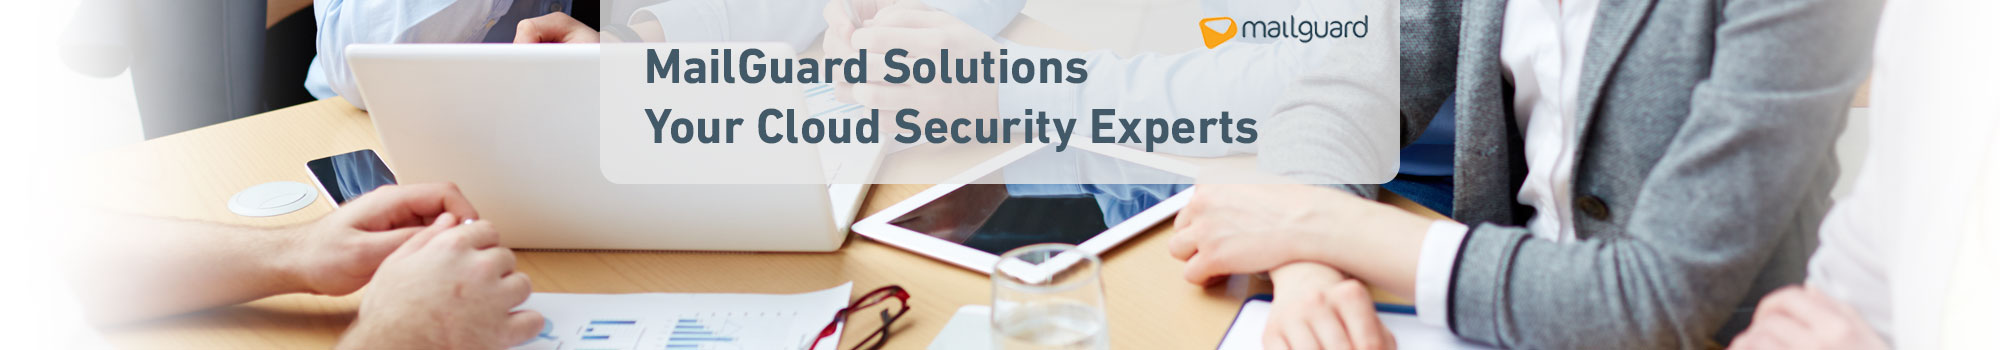 MailGuard Cloud Security Solutions